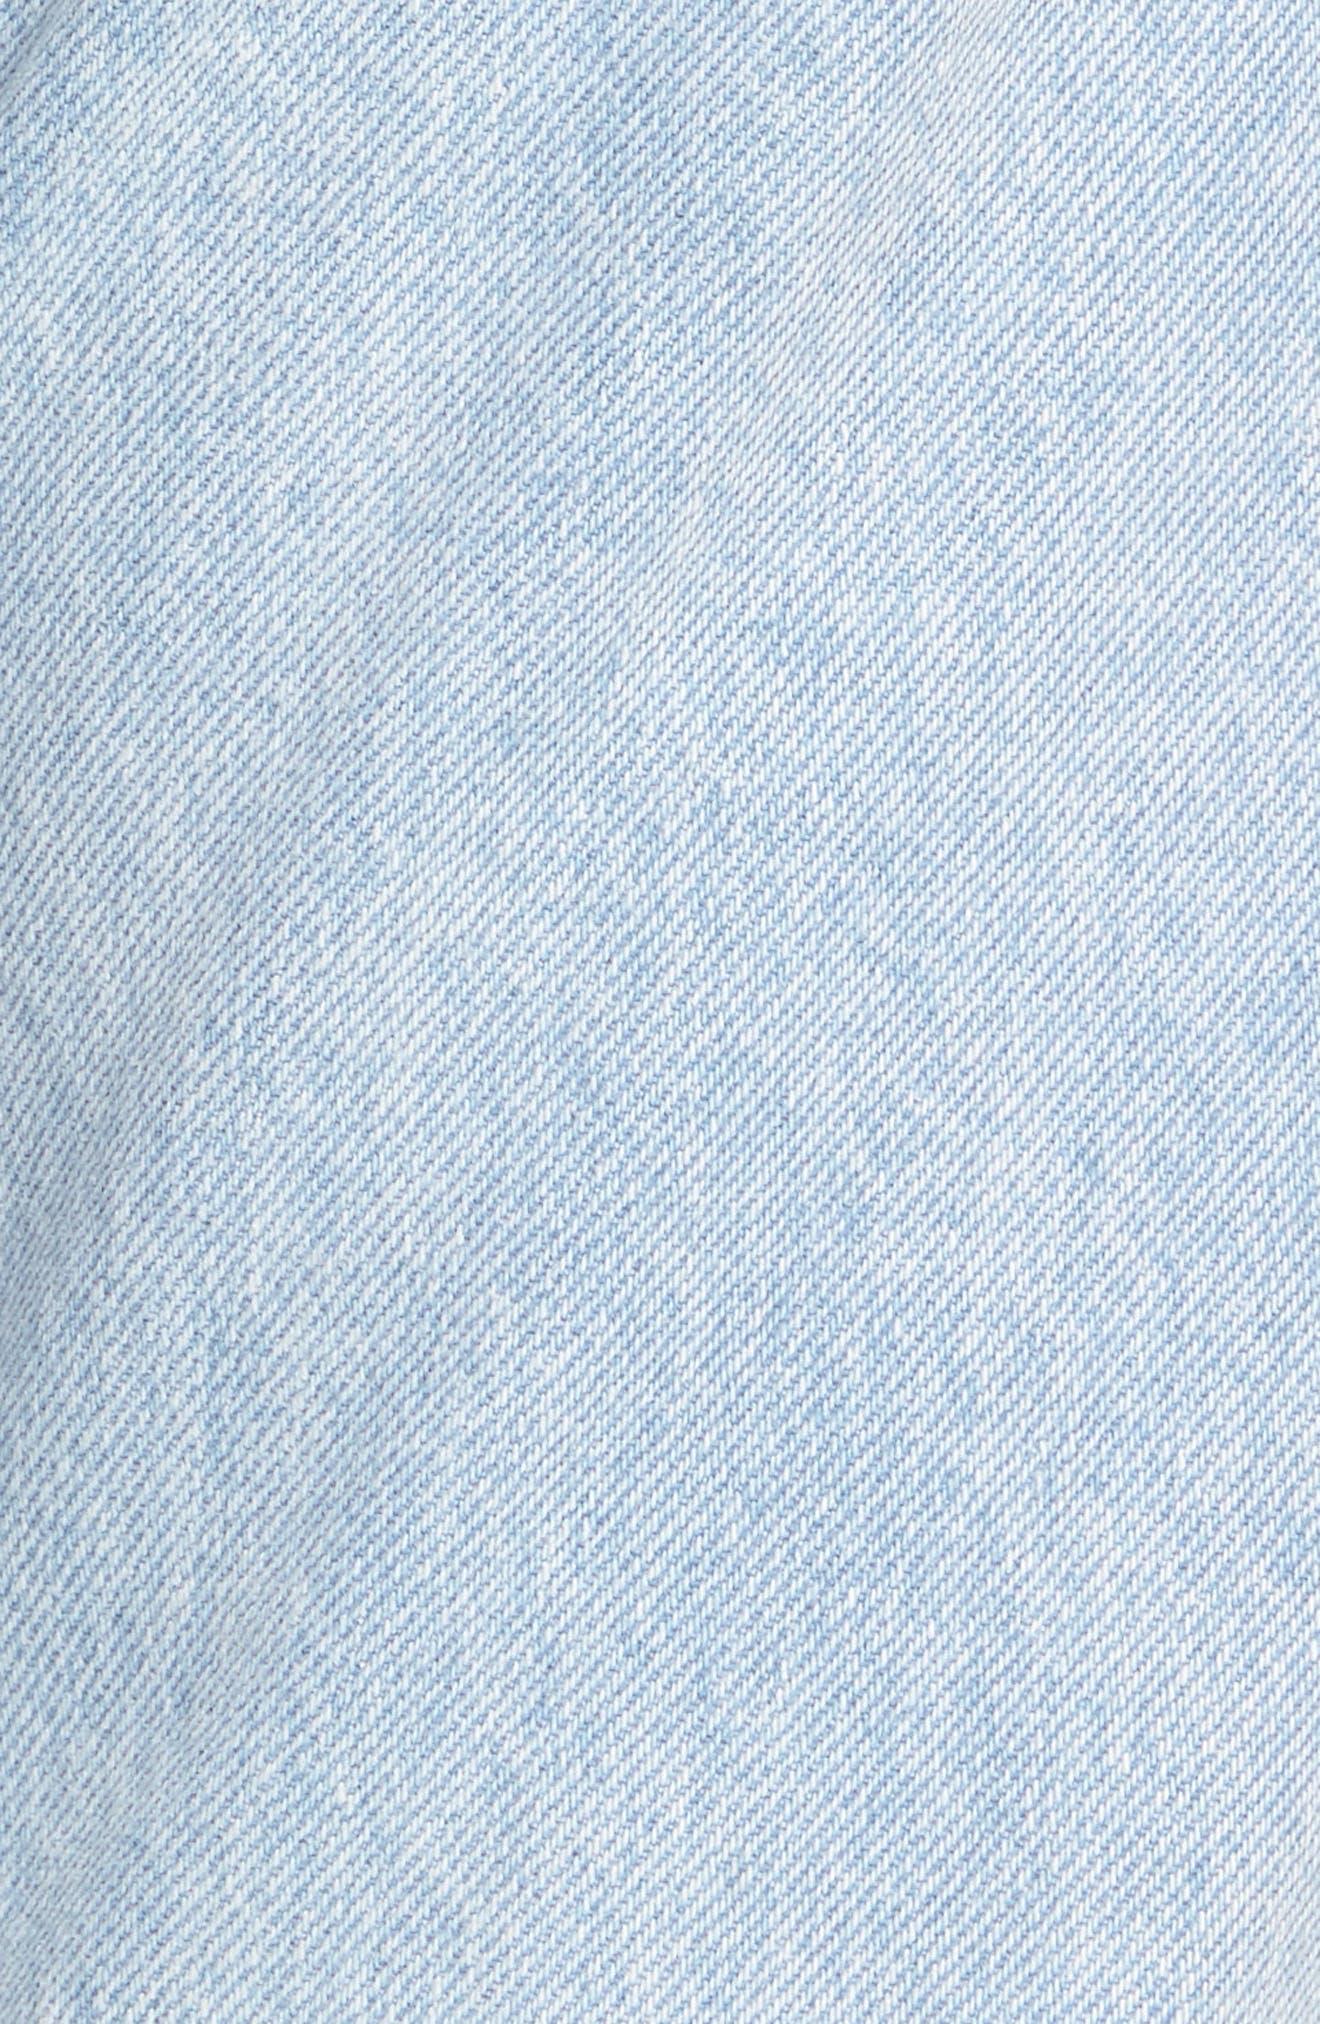 Wedgie High Waist Crop Jeans,                             Alternate thumbnail 5, color,                             450